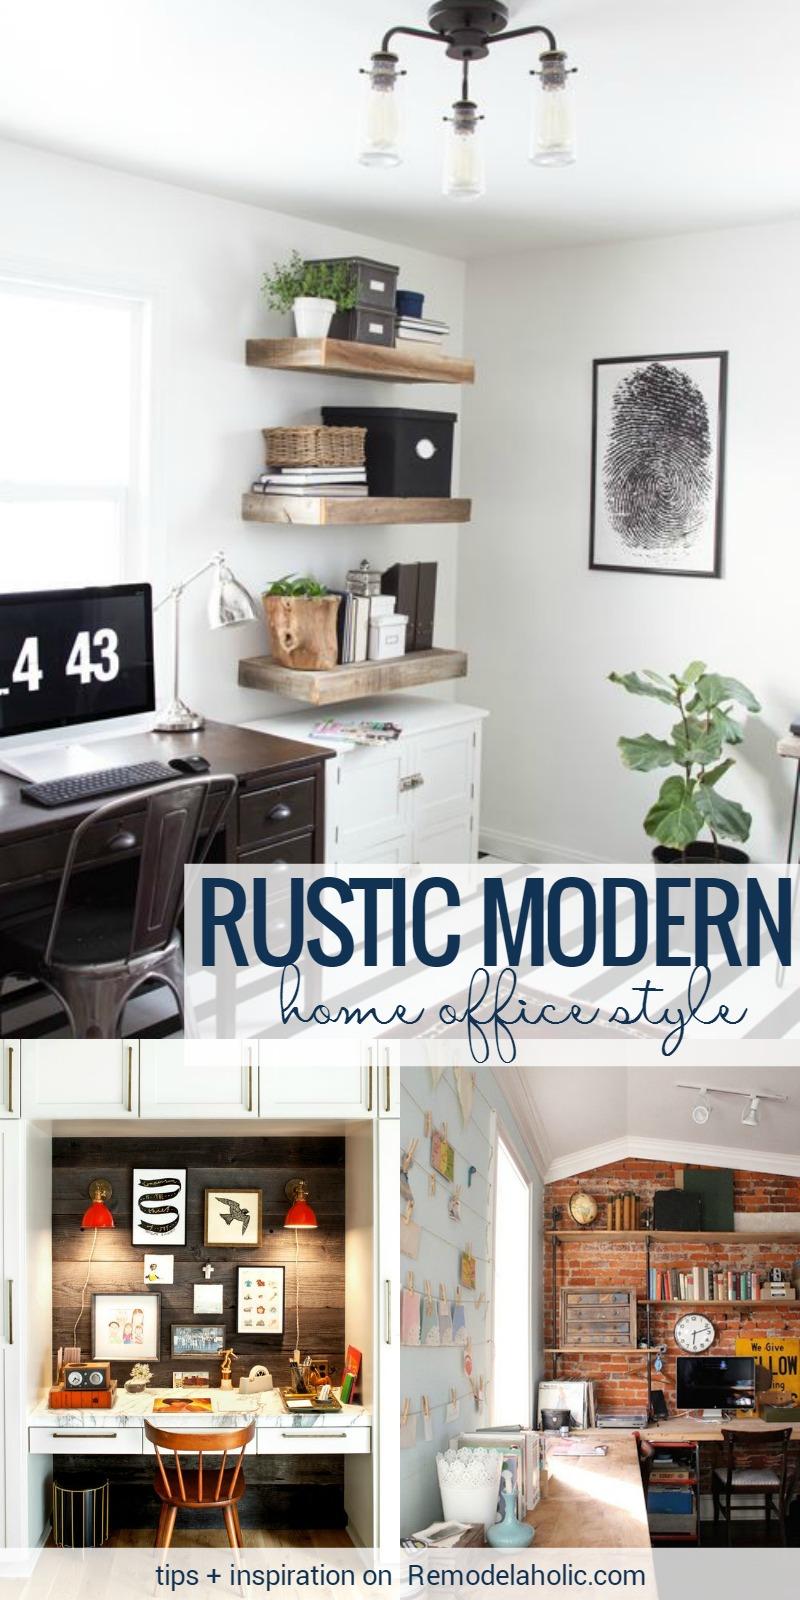 Remodelaholic | Rustic Modern Home Office Design ...